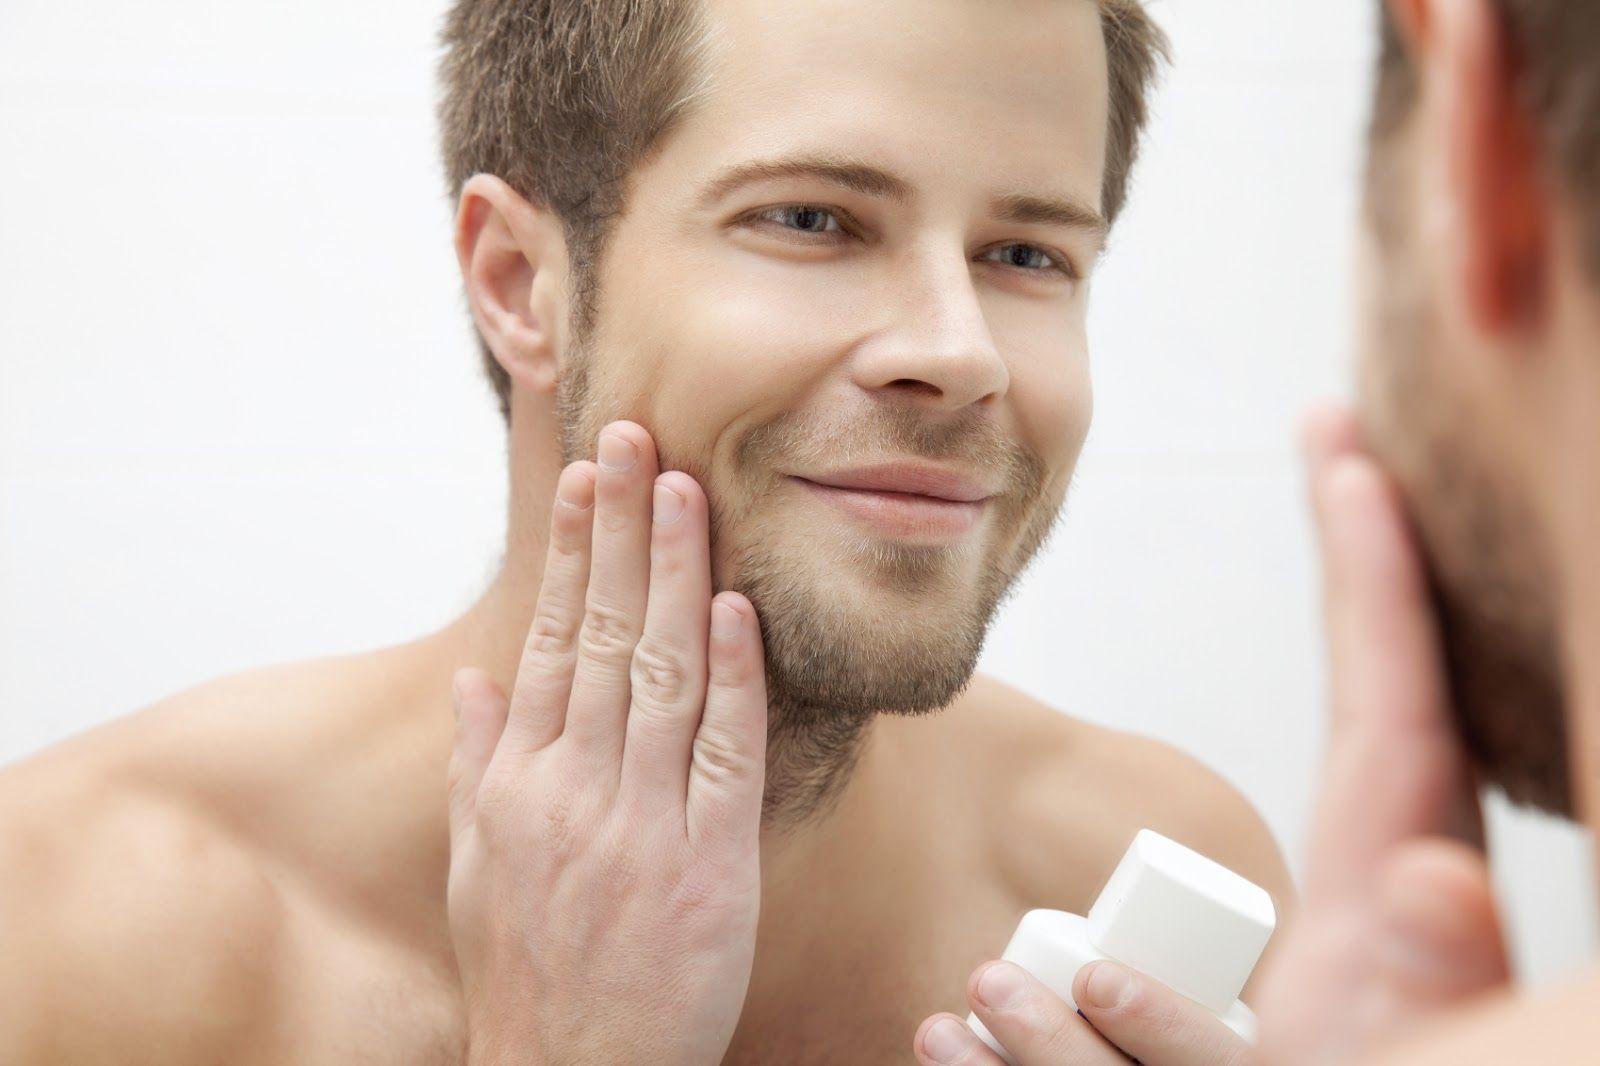 Https 3 Bp Blogspot Com 15chmvv2a44 Vuaqxbfwlri Aaaaaaaajk8 Sp40b7humjo S1600 Tinted Moisturiser For Men J Skin Care Essentials Best Face Products Skin Care